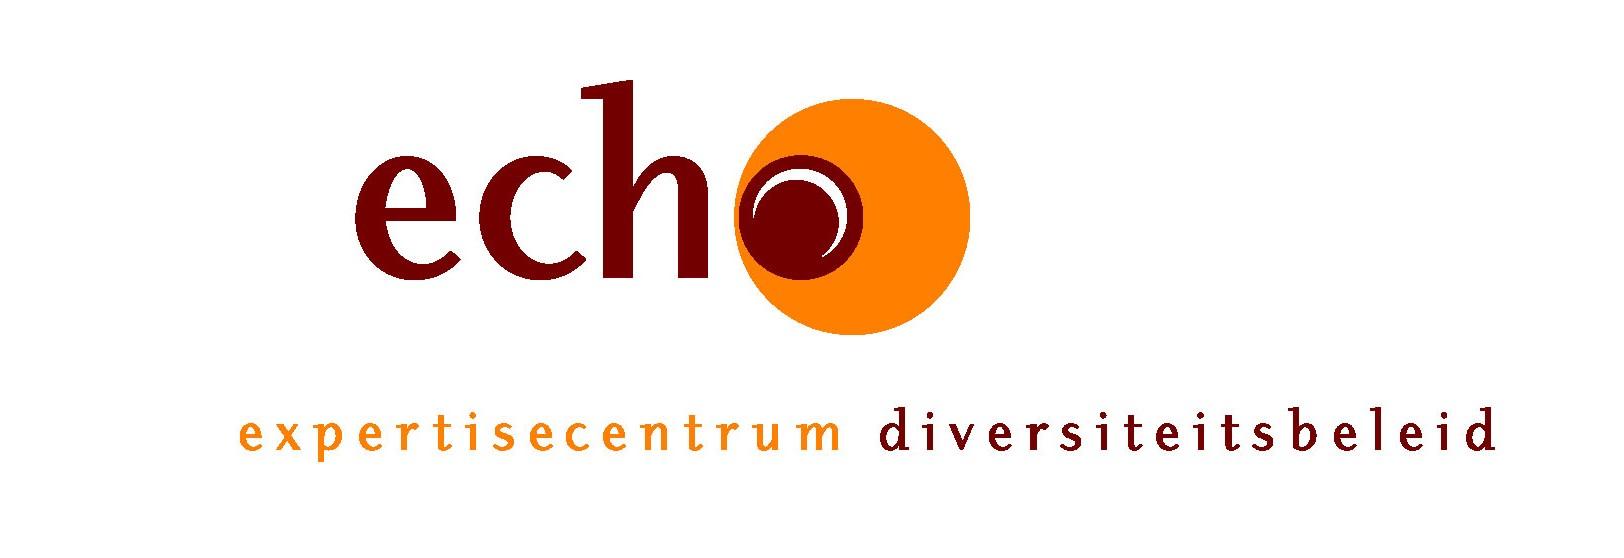 echo kleur